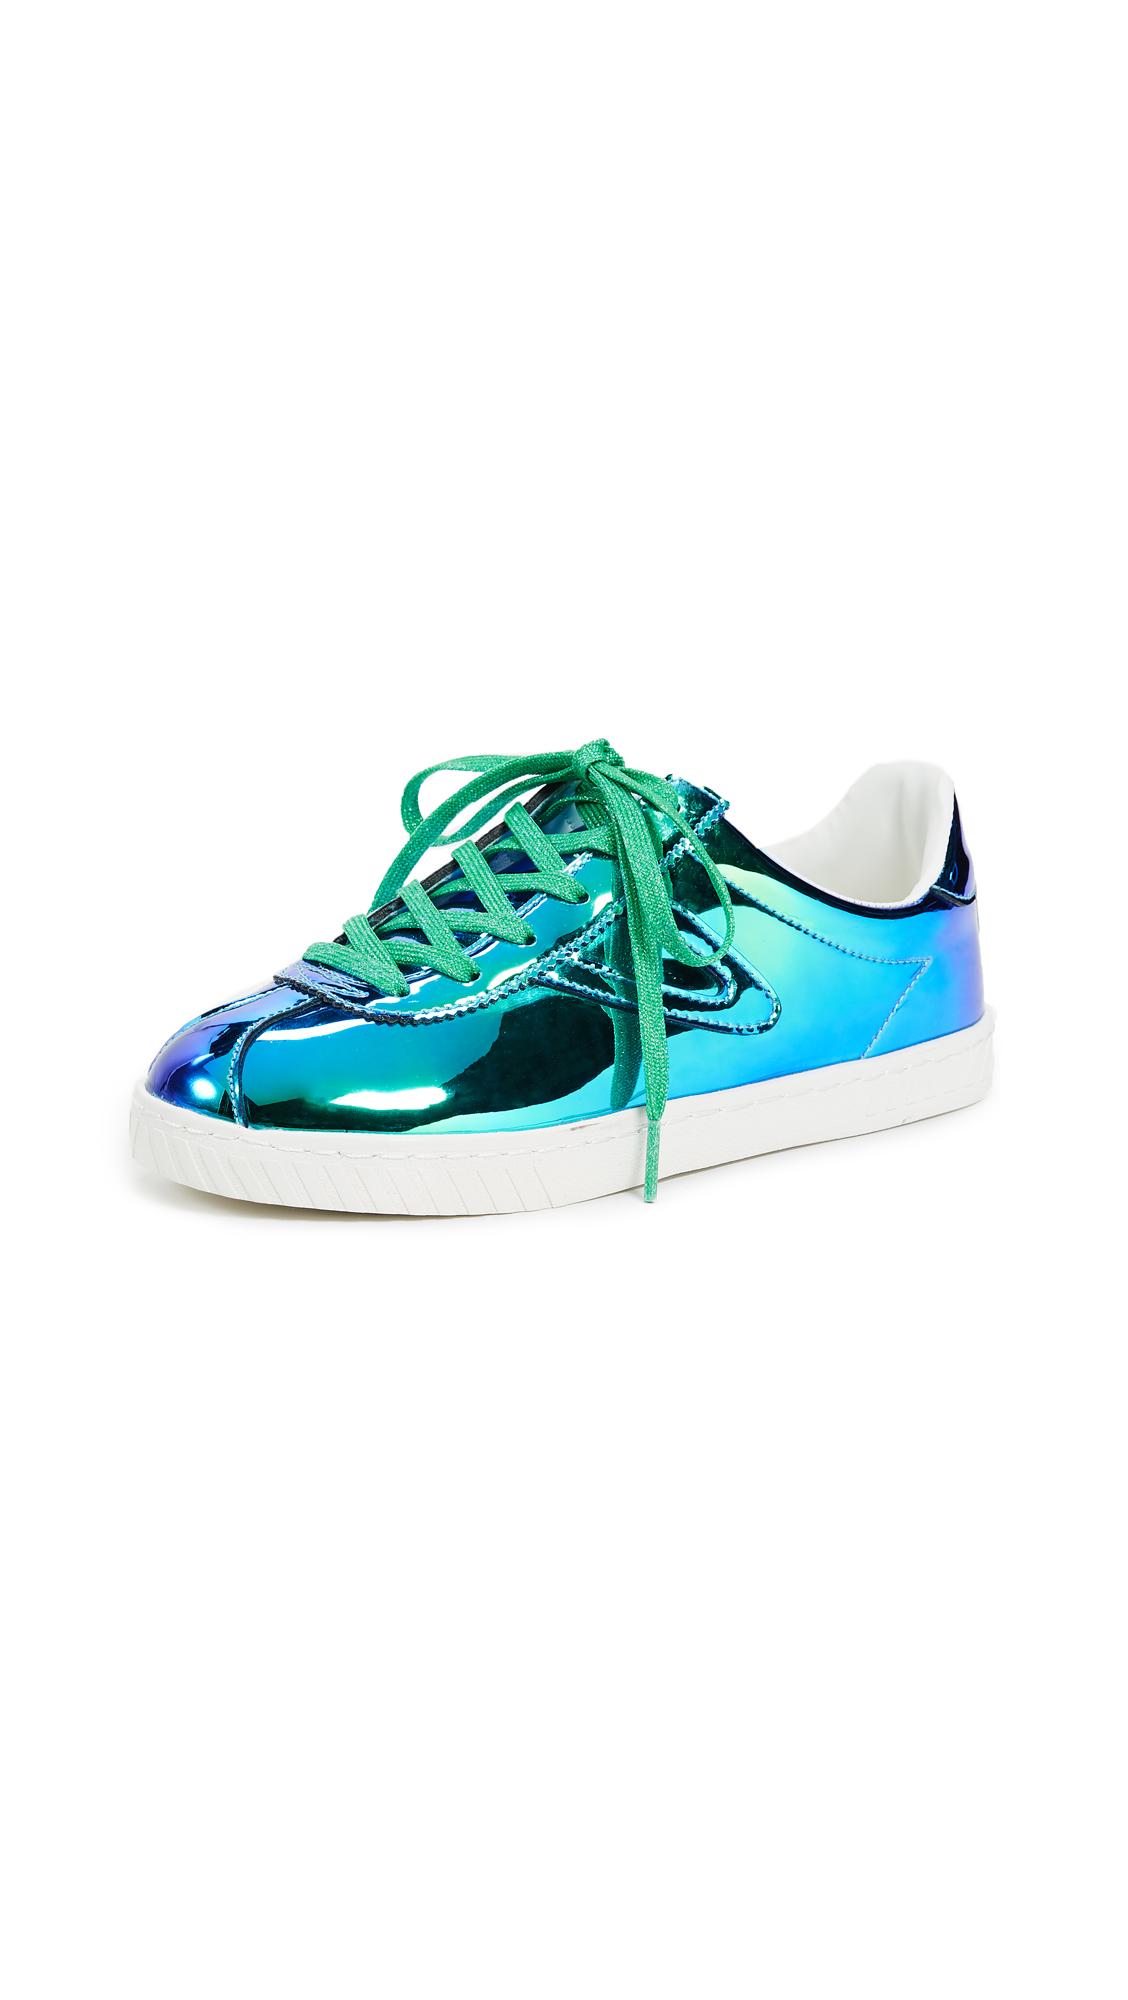 Tretorn Camden Iridescent Lace Up Sneakers - Medium Blue